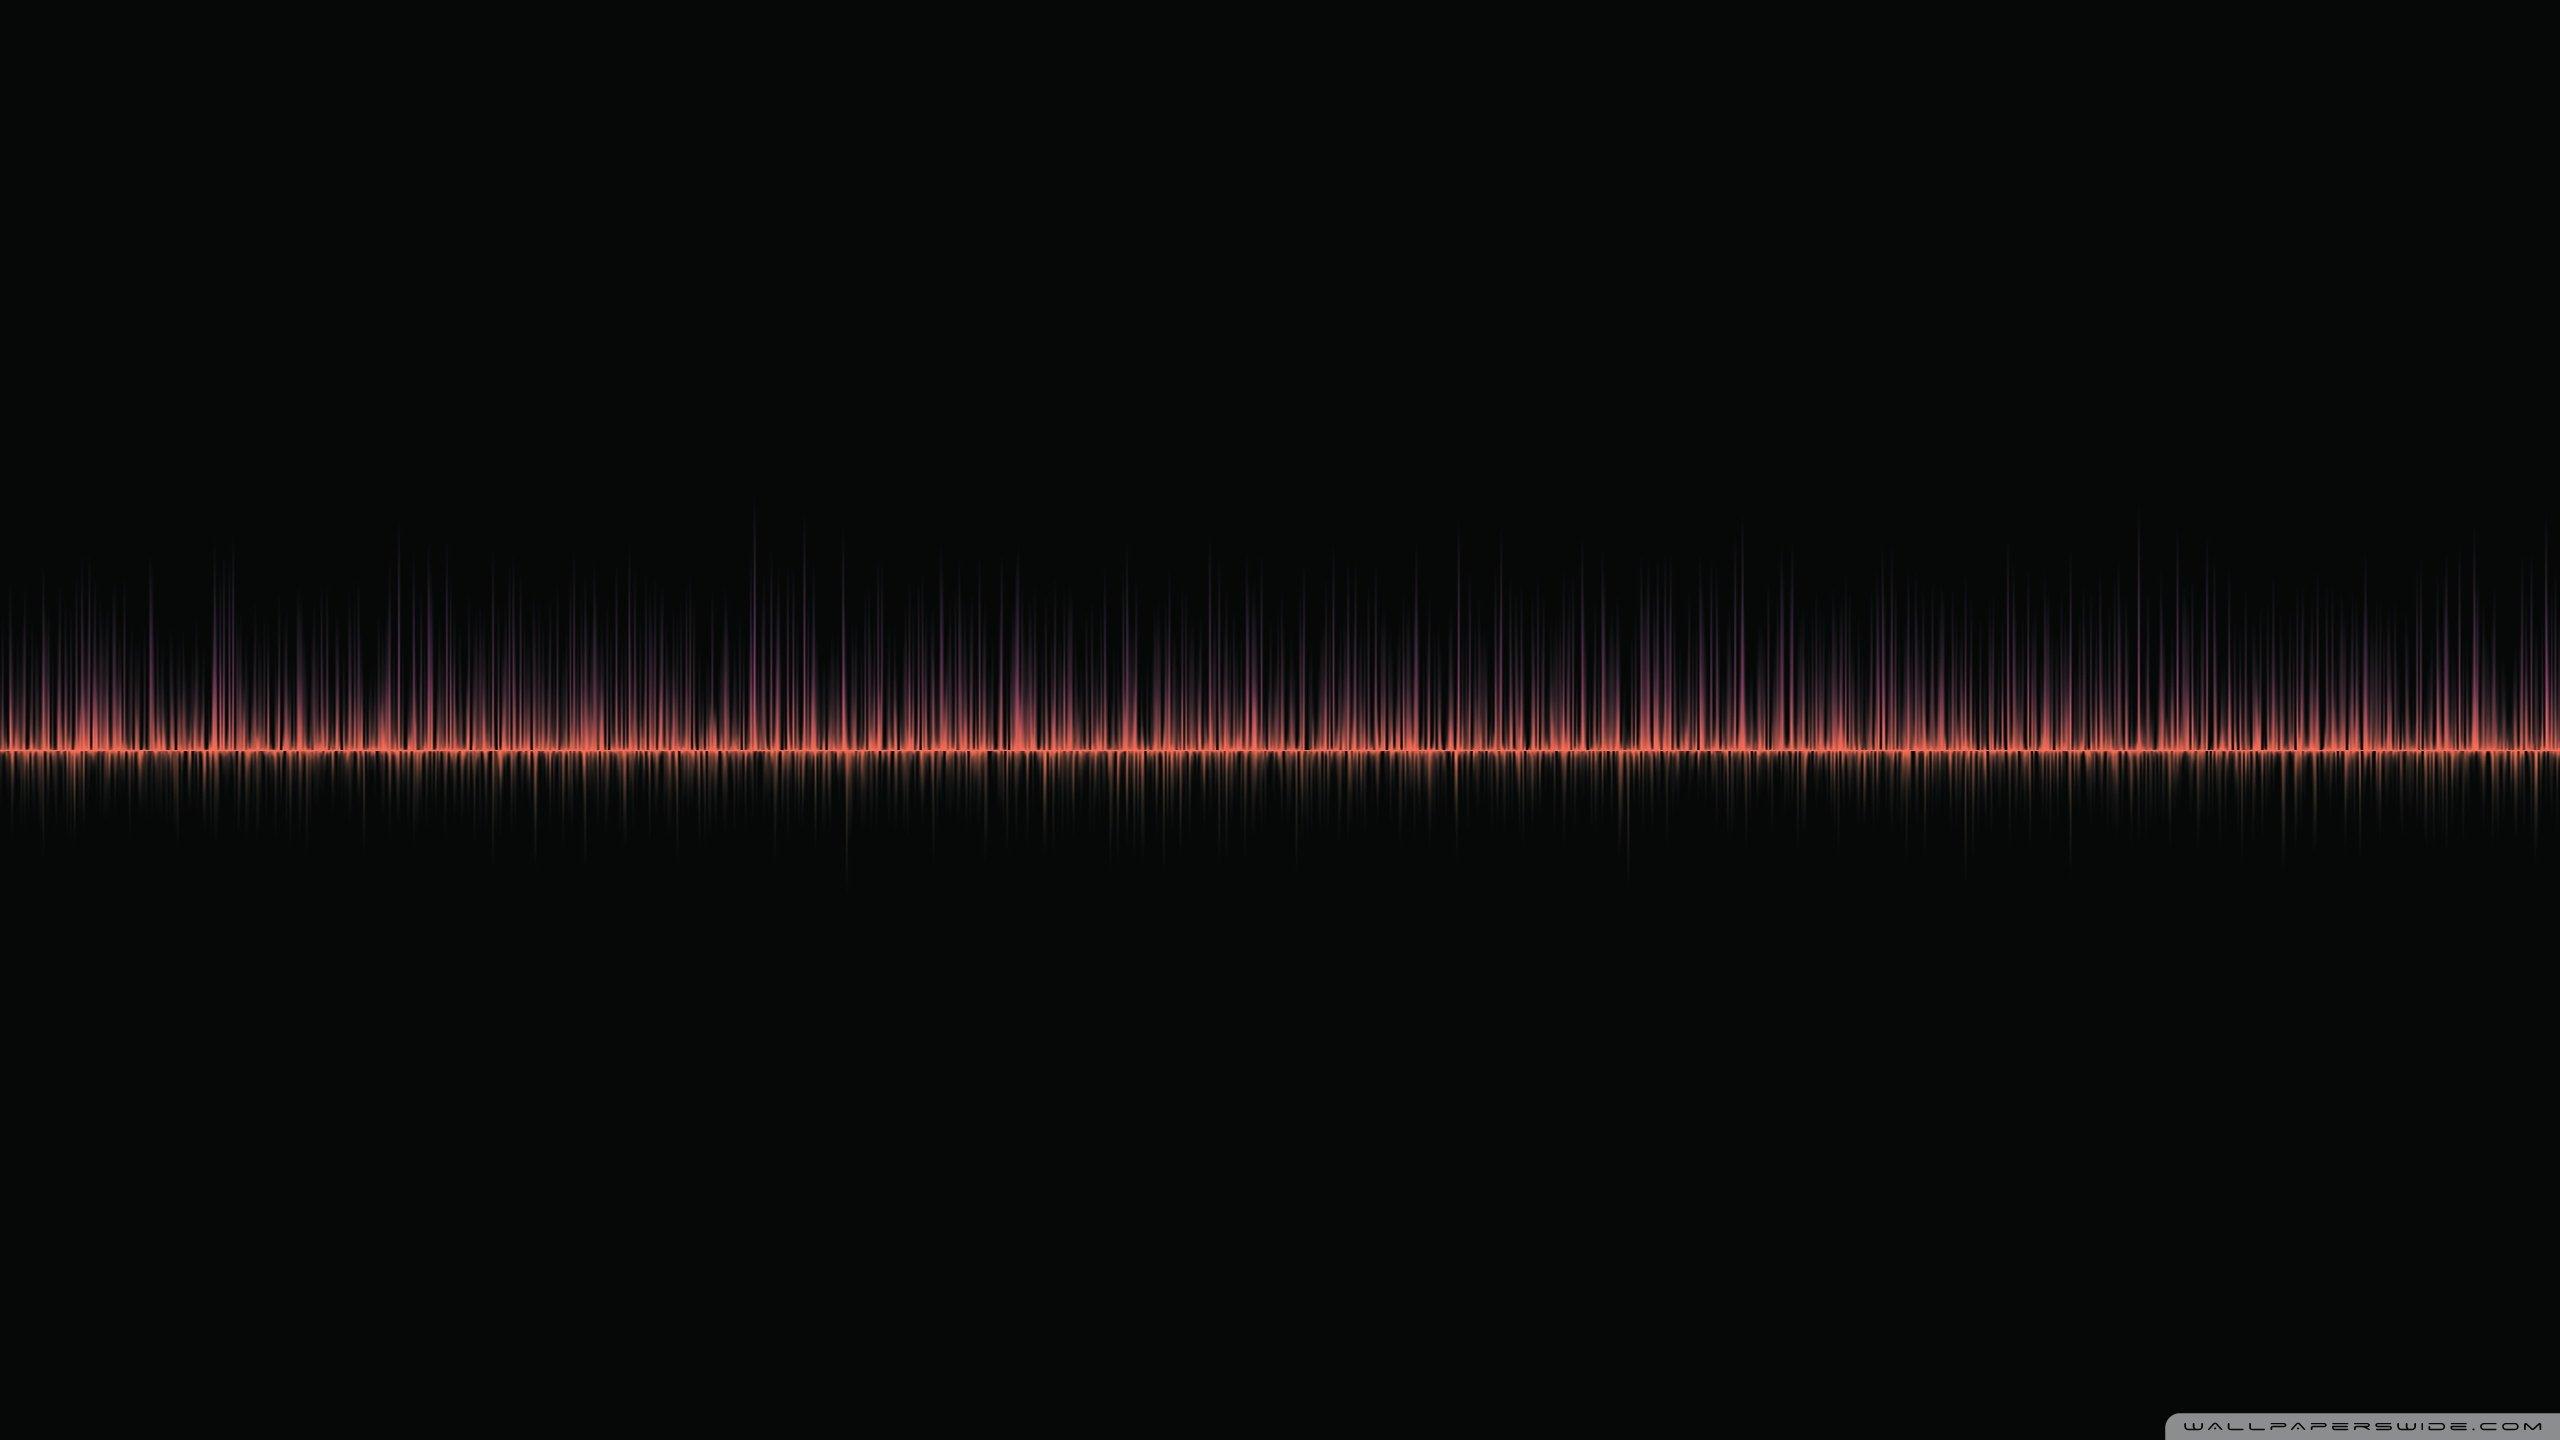 Sound waves 3 wallpaper 2560x1440 wallpaper 2560x1440 290375 2560x1440